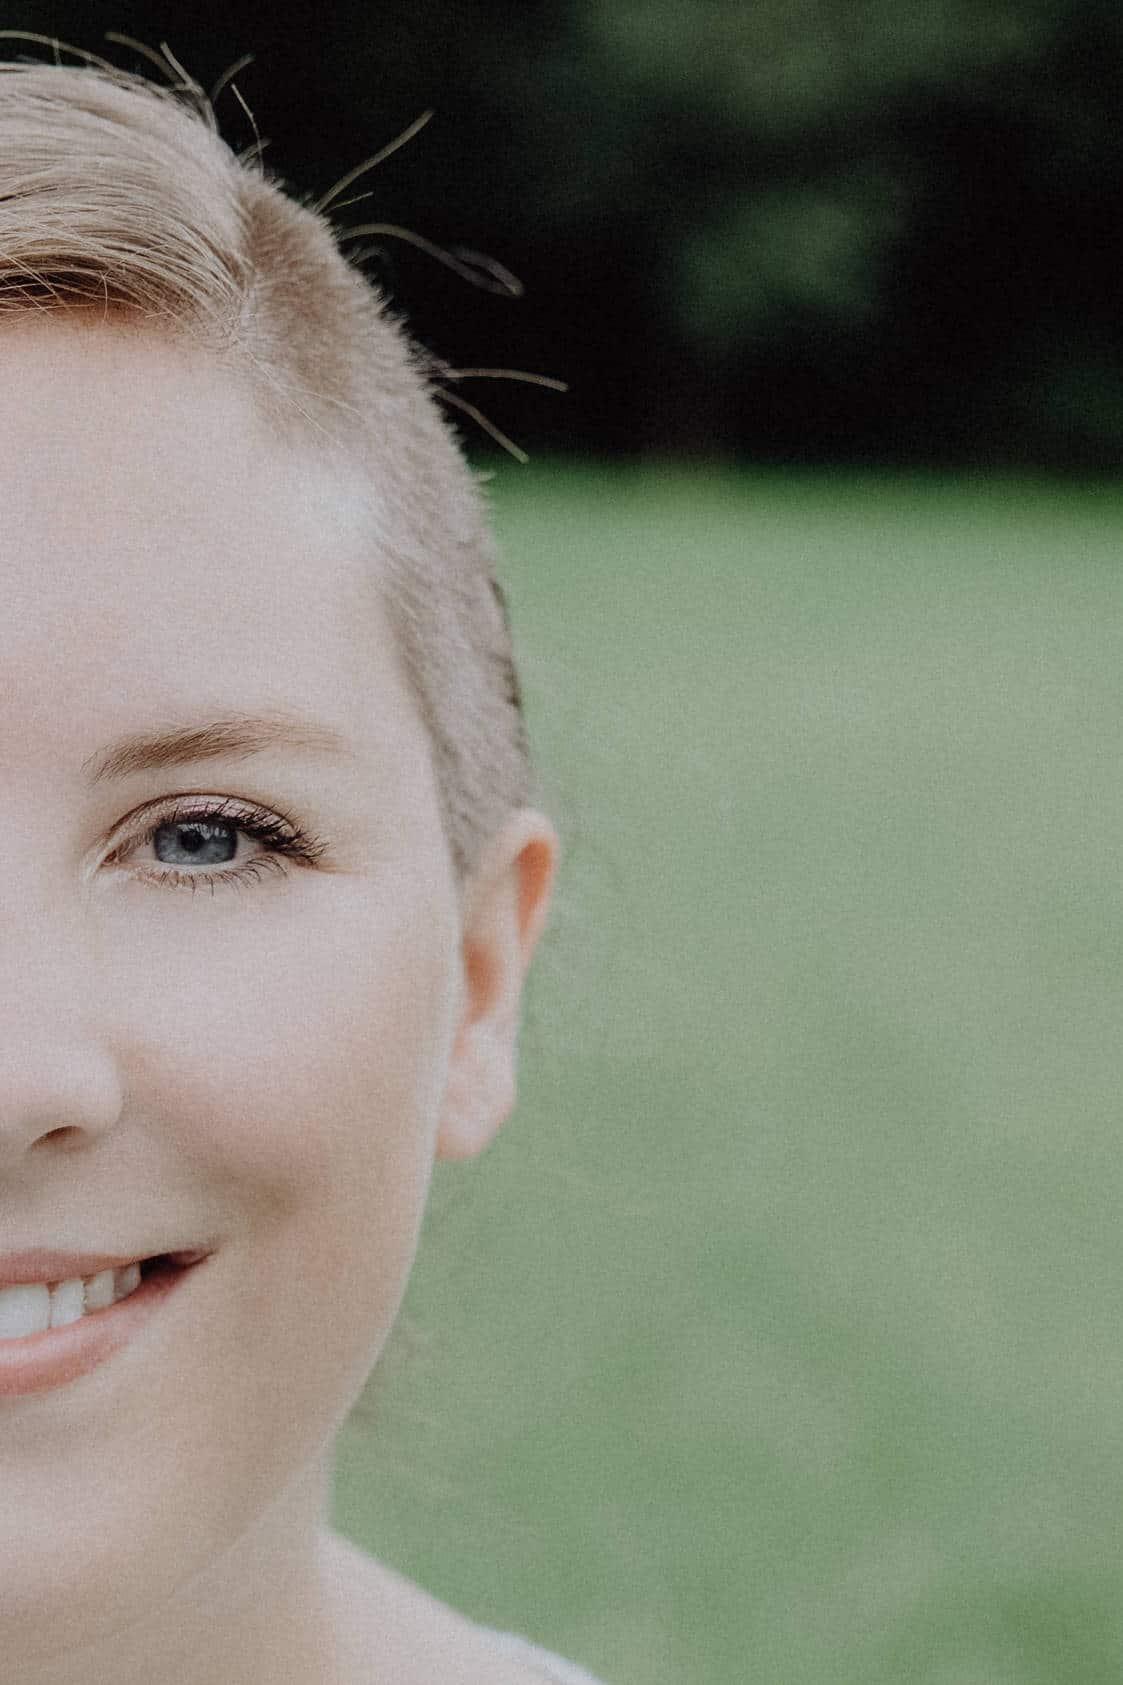 Katharina-Zwerger-Pinetree-photography-fotograf-darmstadt-mainz-wiesbaden-portraitshooting-outdoor